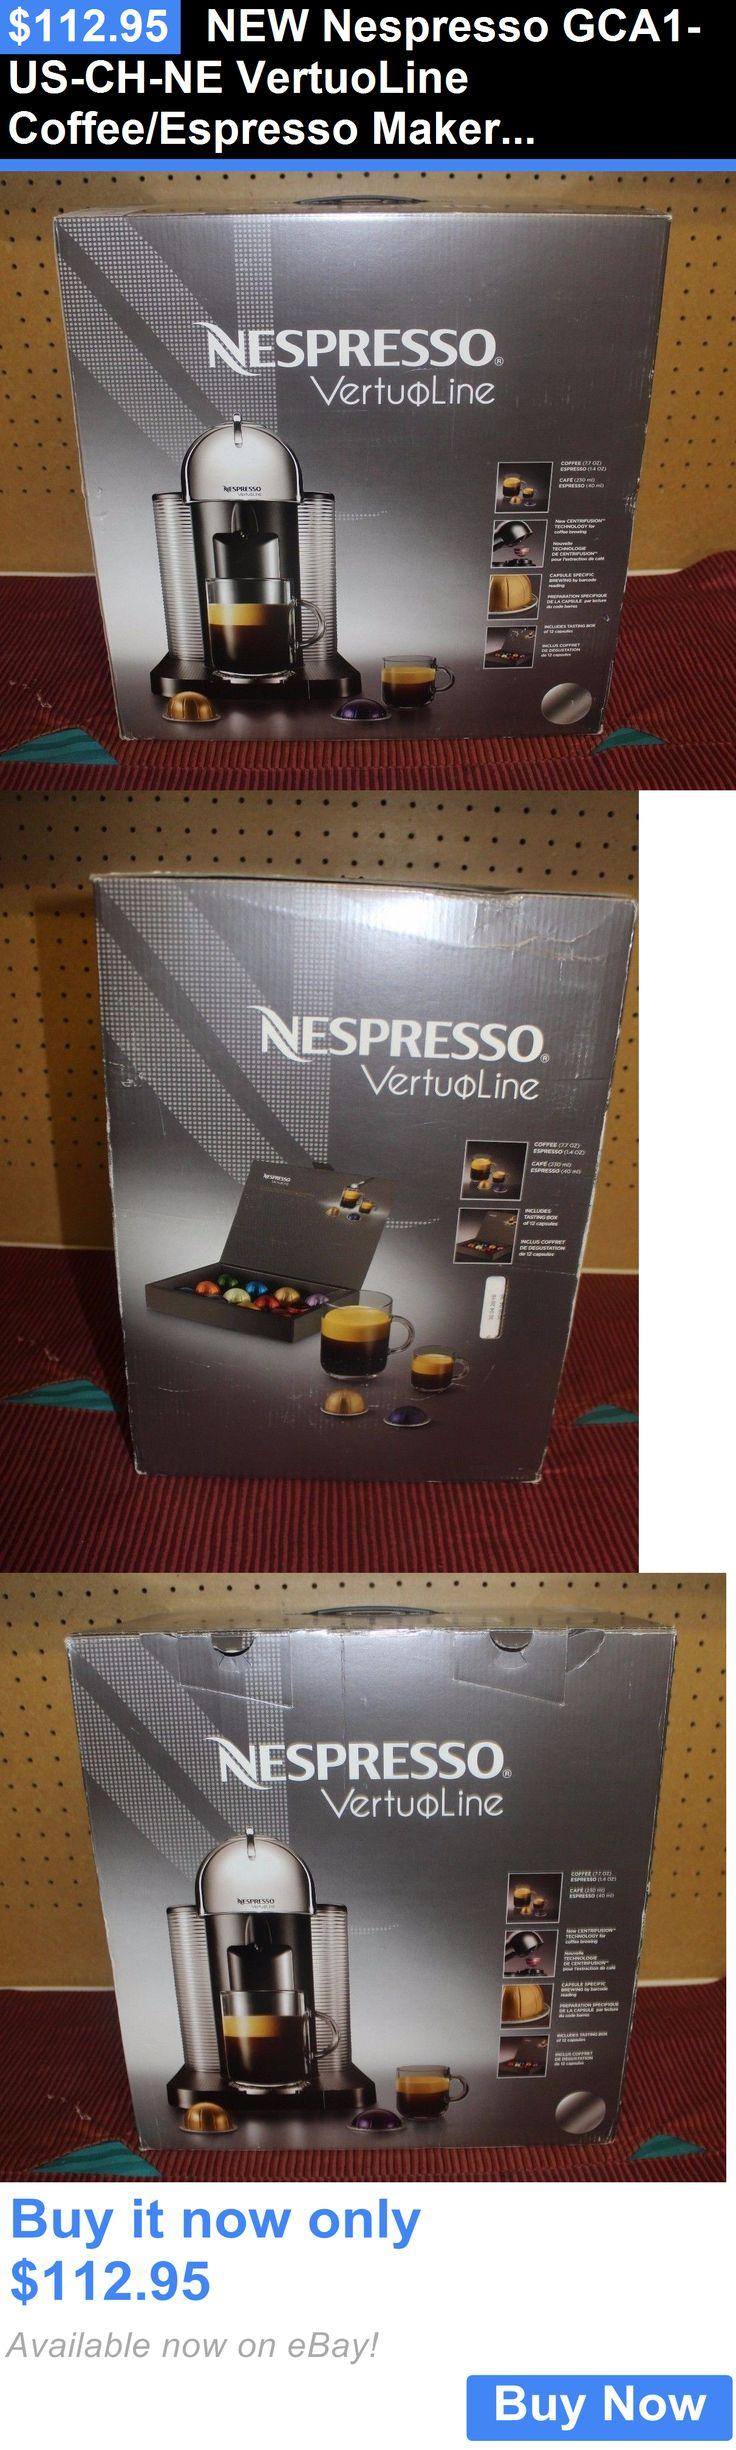 Small Kitchen Appliances: New Nespresso Gca1-Us-Ch-Ne Vertuoline Coffee/Espresso Maker Free Shipping BUY IT NOW ONLY: $112.95